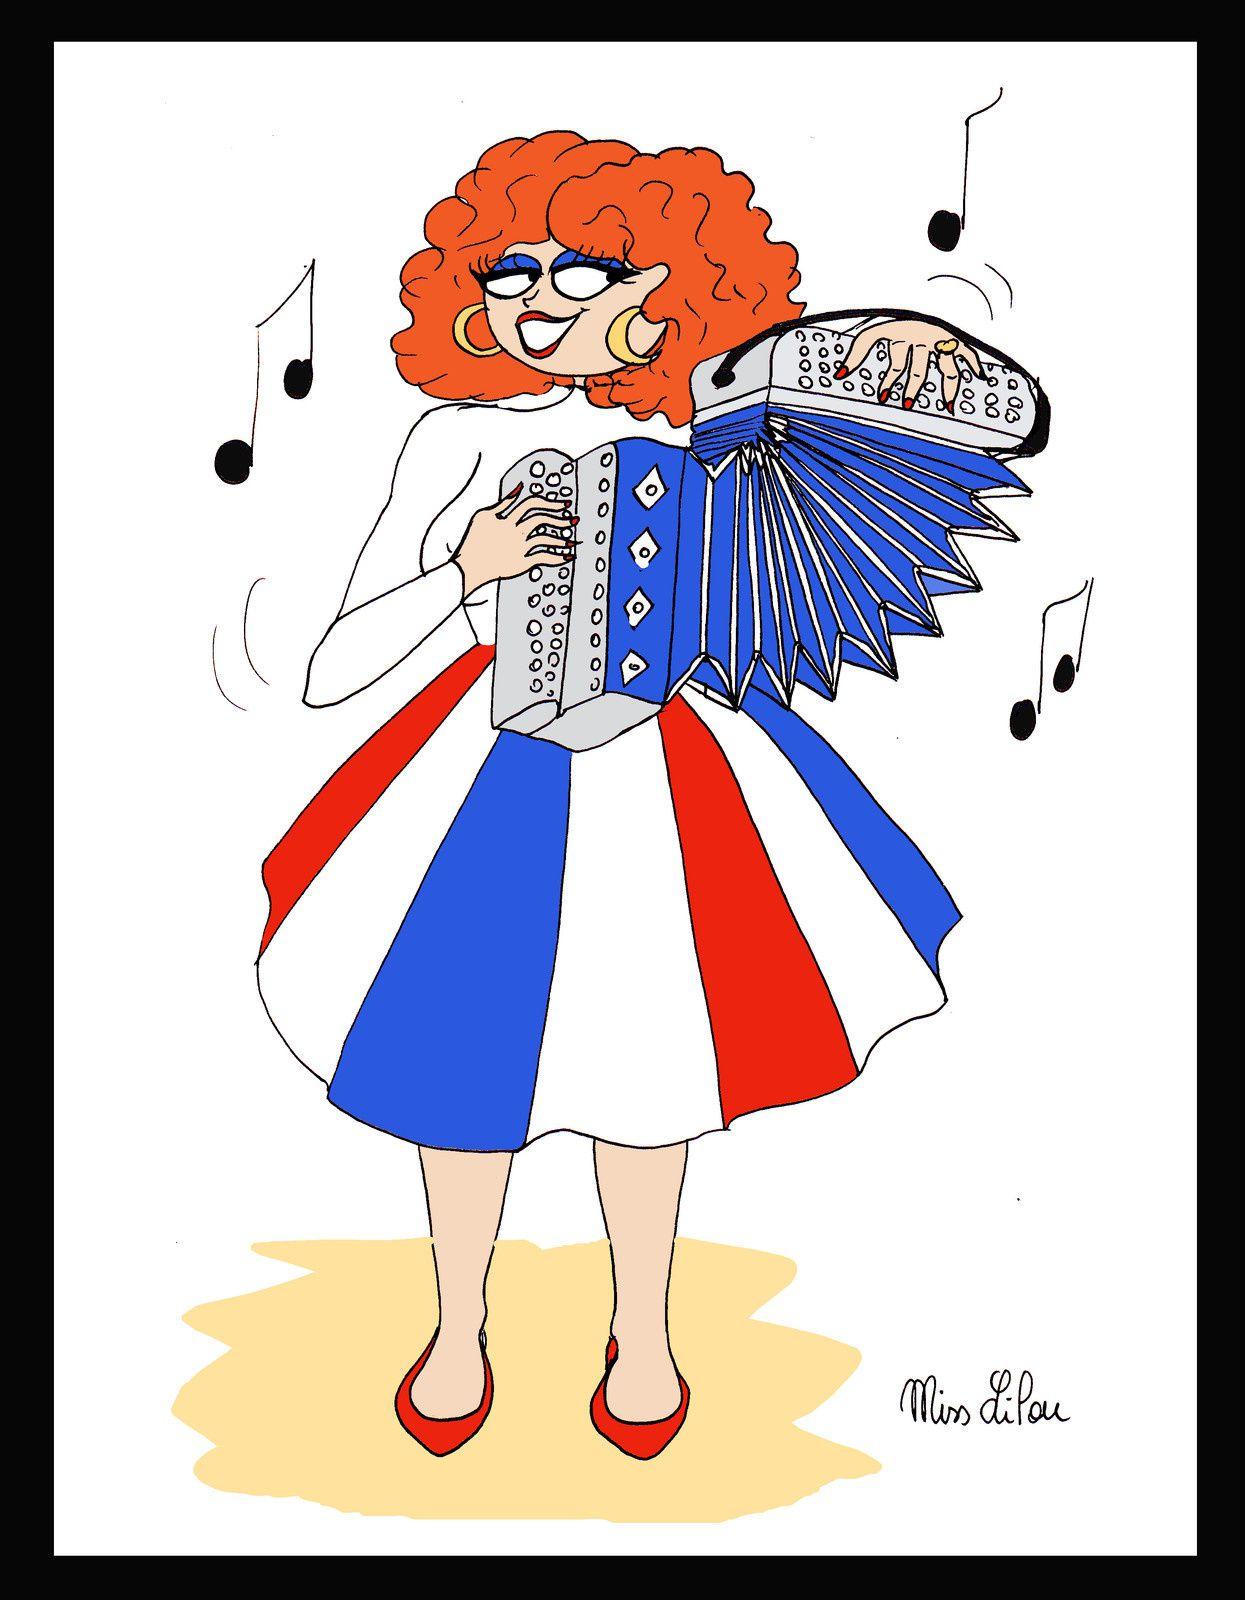 Eterna reina del bal-musette / Eternal queen of the bal-musette